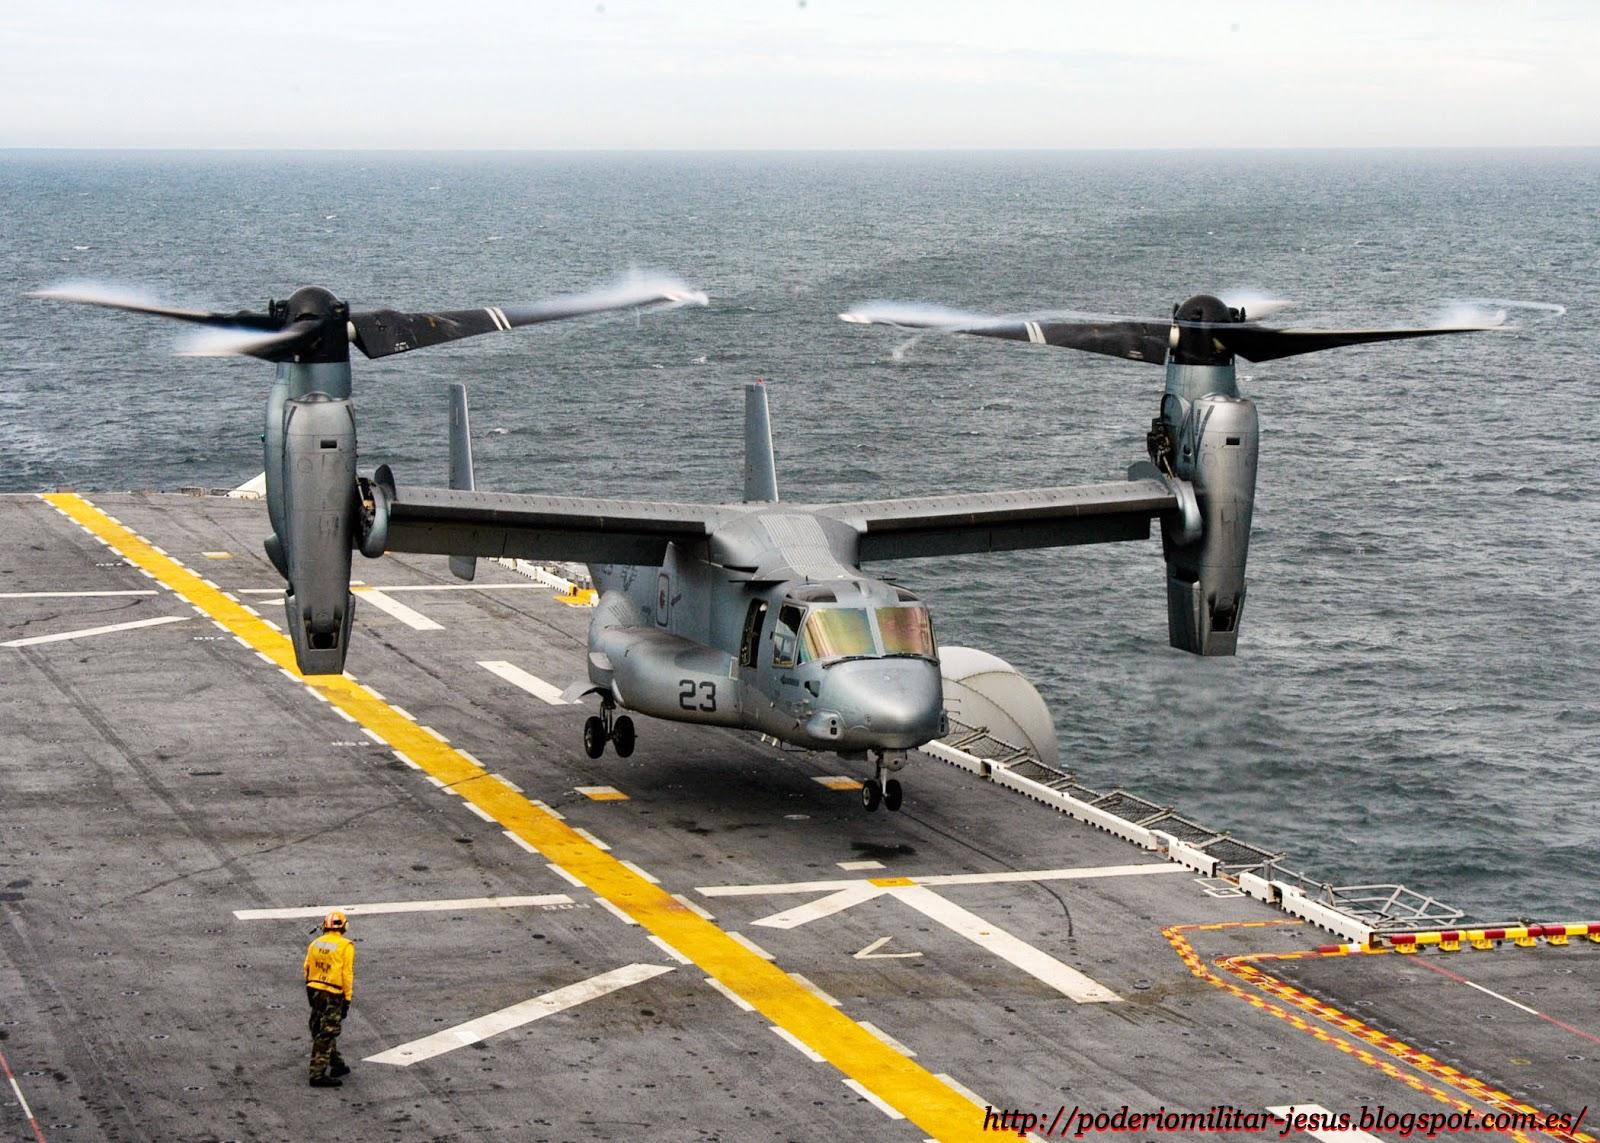 Bell-Boeing V-22 Osprey  (aeronave militar polivalente, catalogada como convertiplano USA) )  - Página 2 Helicoptero%2BV-22%2B%281%29